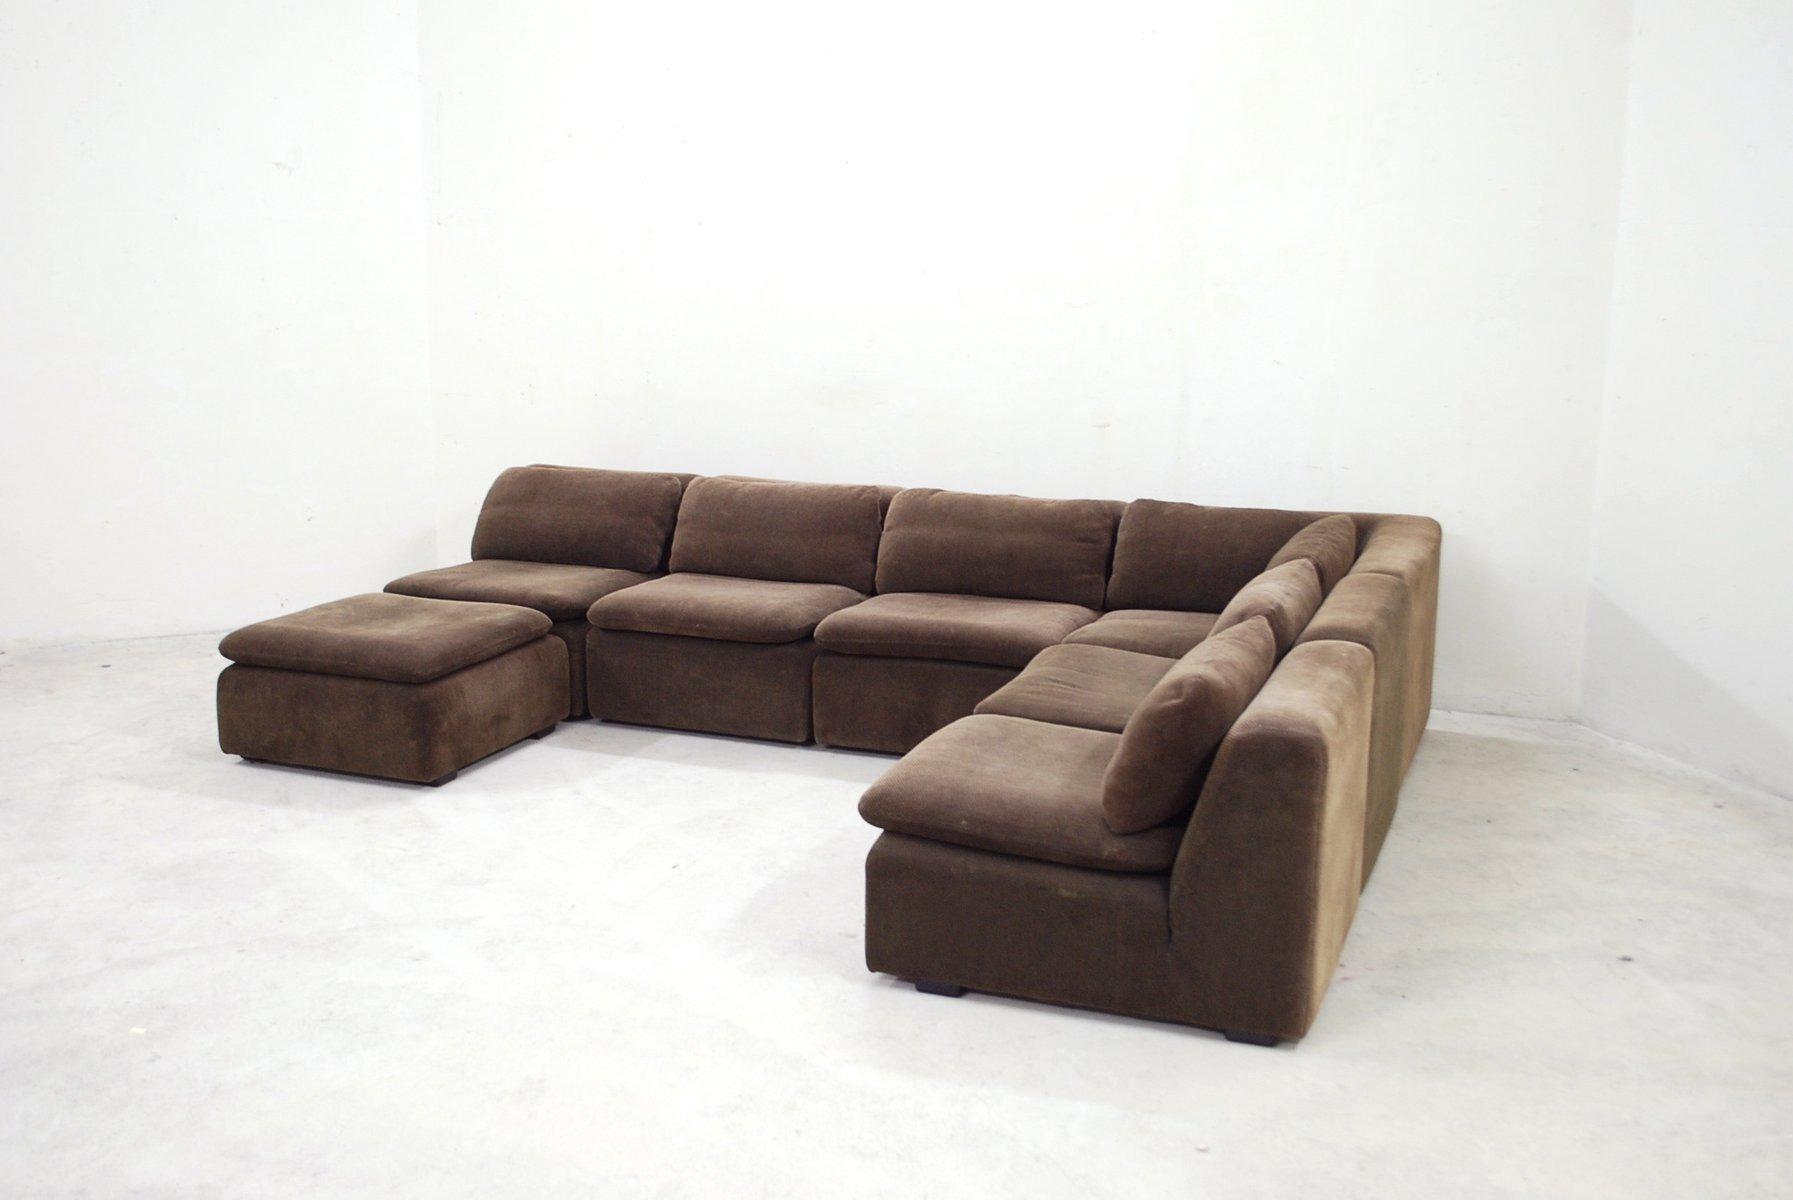 Vintage Brown Modular Sofa from Cor for sale at Pamono